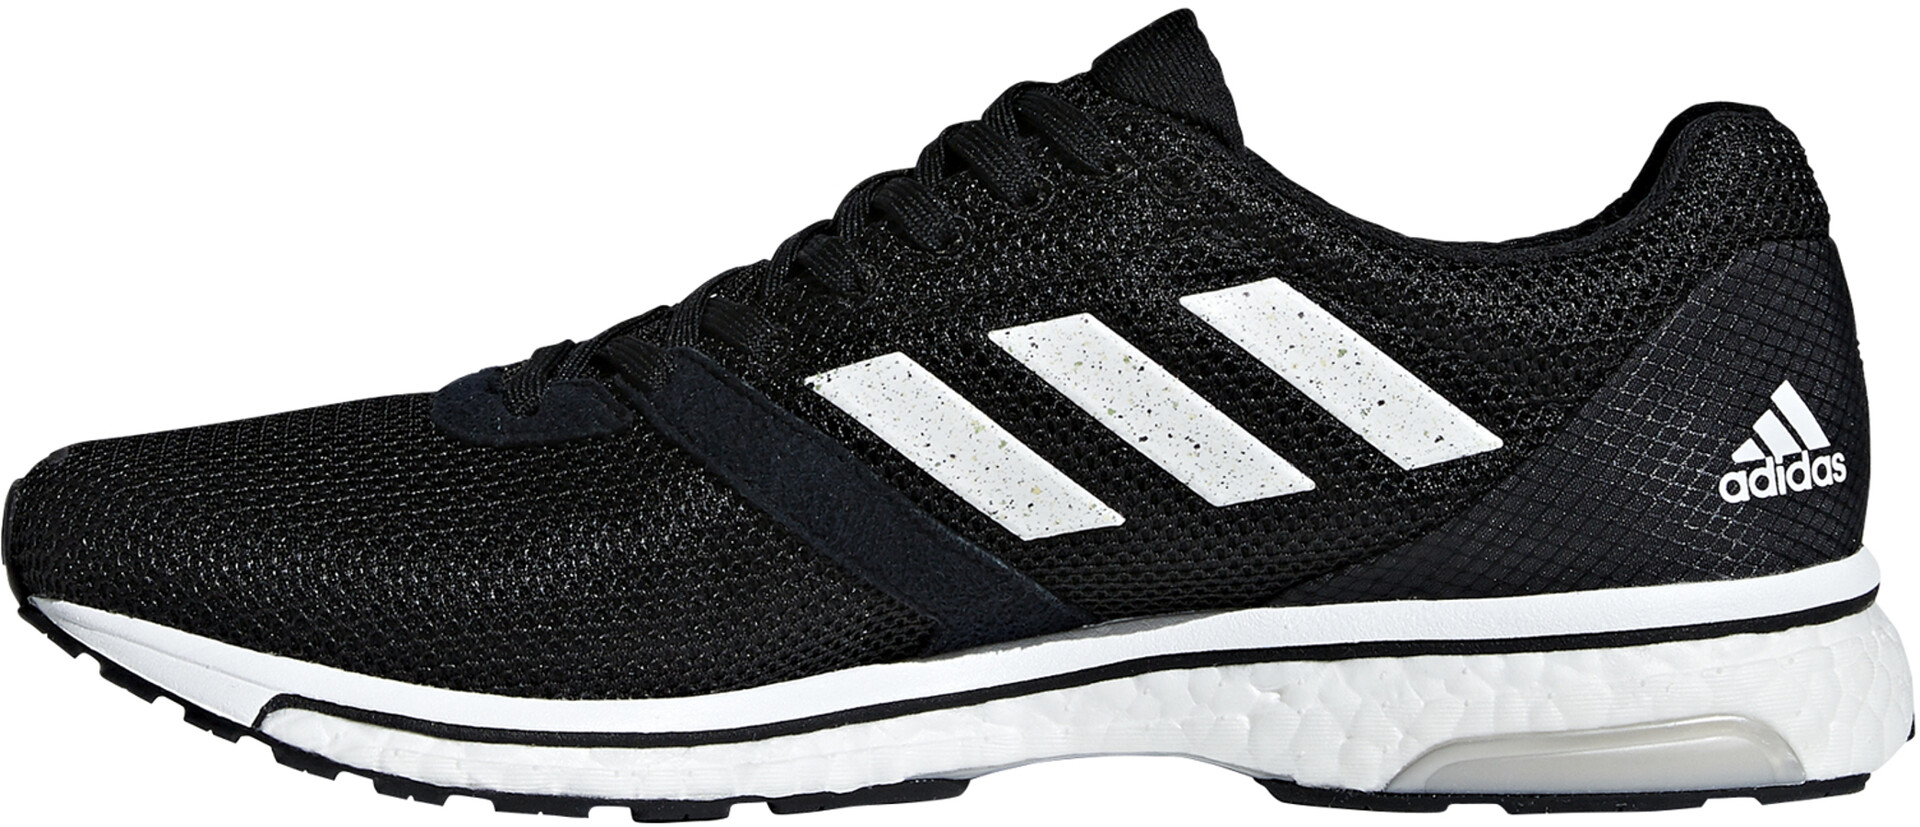 adidas Adizero Adios 4 Schoenen Heren, core blackftwr whitecore black